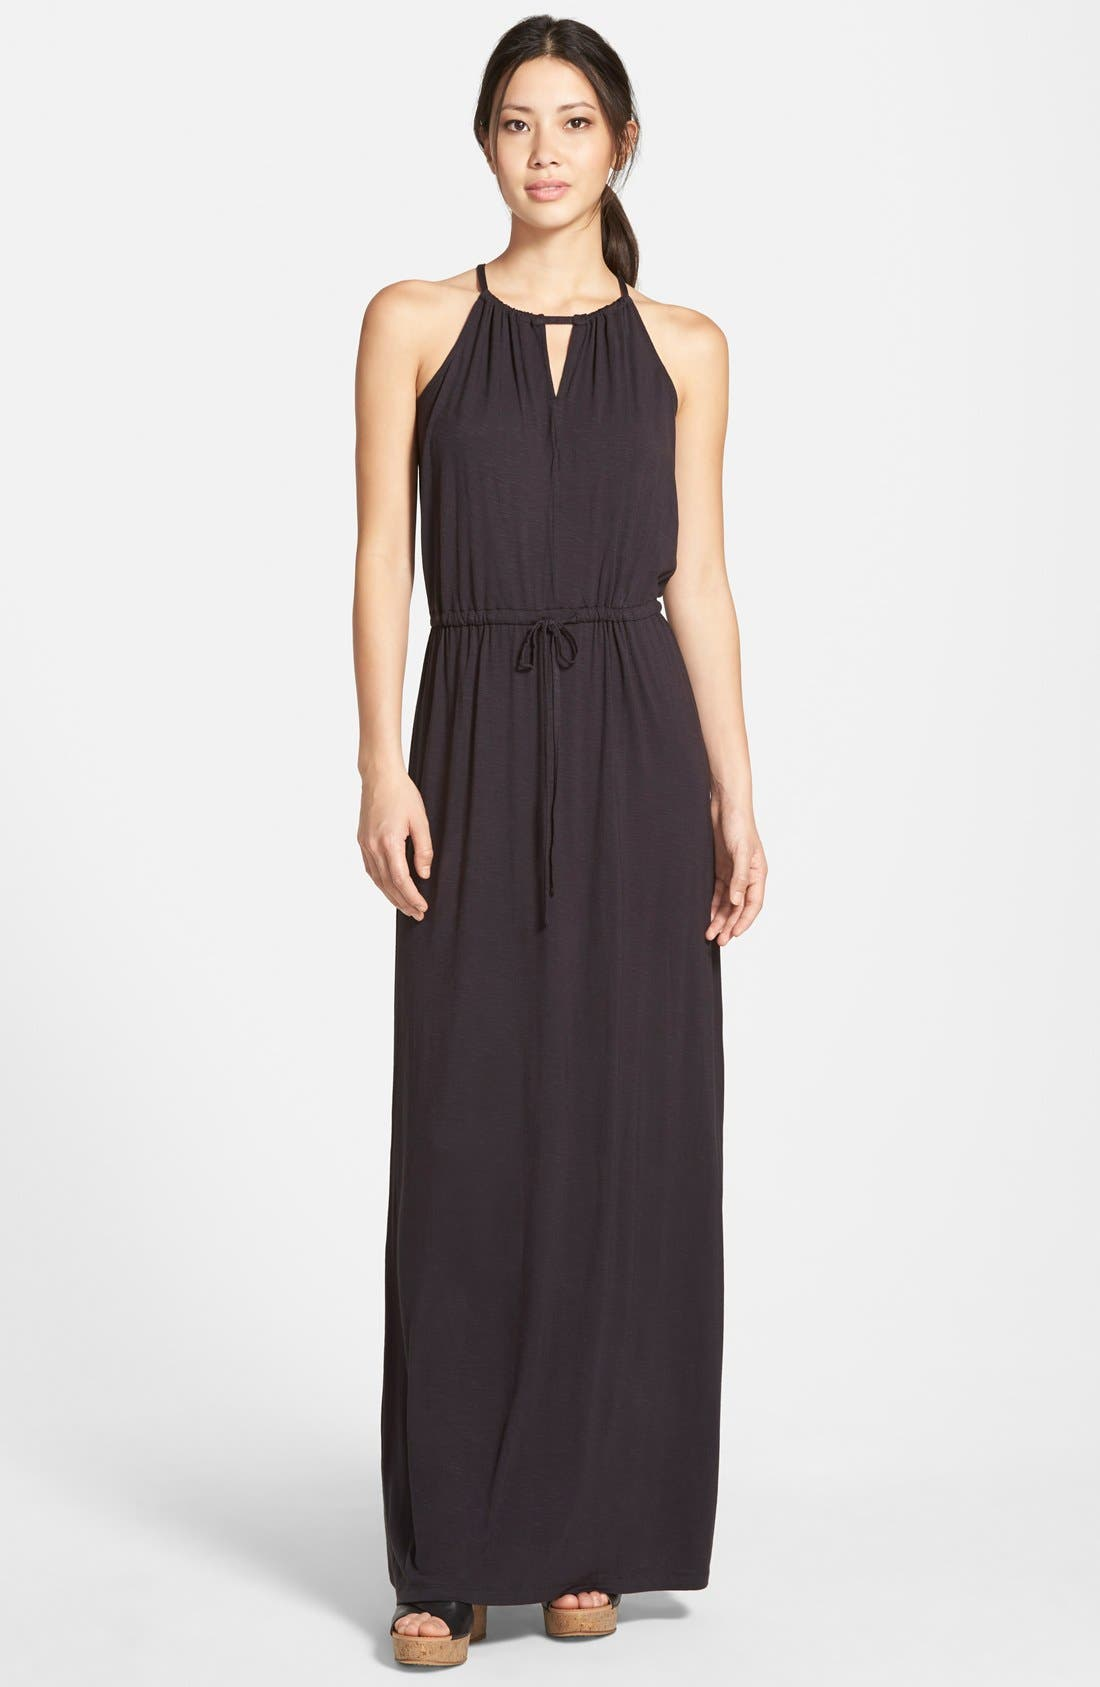 Alternate Image 1 Selected - Caslon® Keyhole Halter Style Maxi Dress (Regular & Petite)